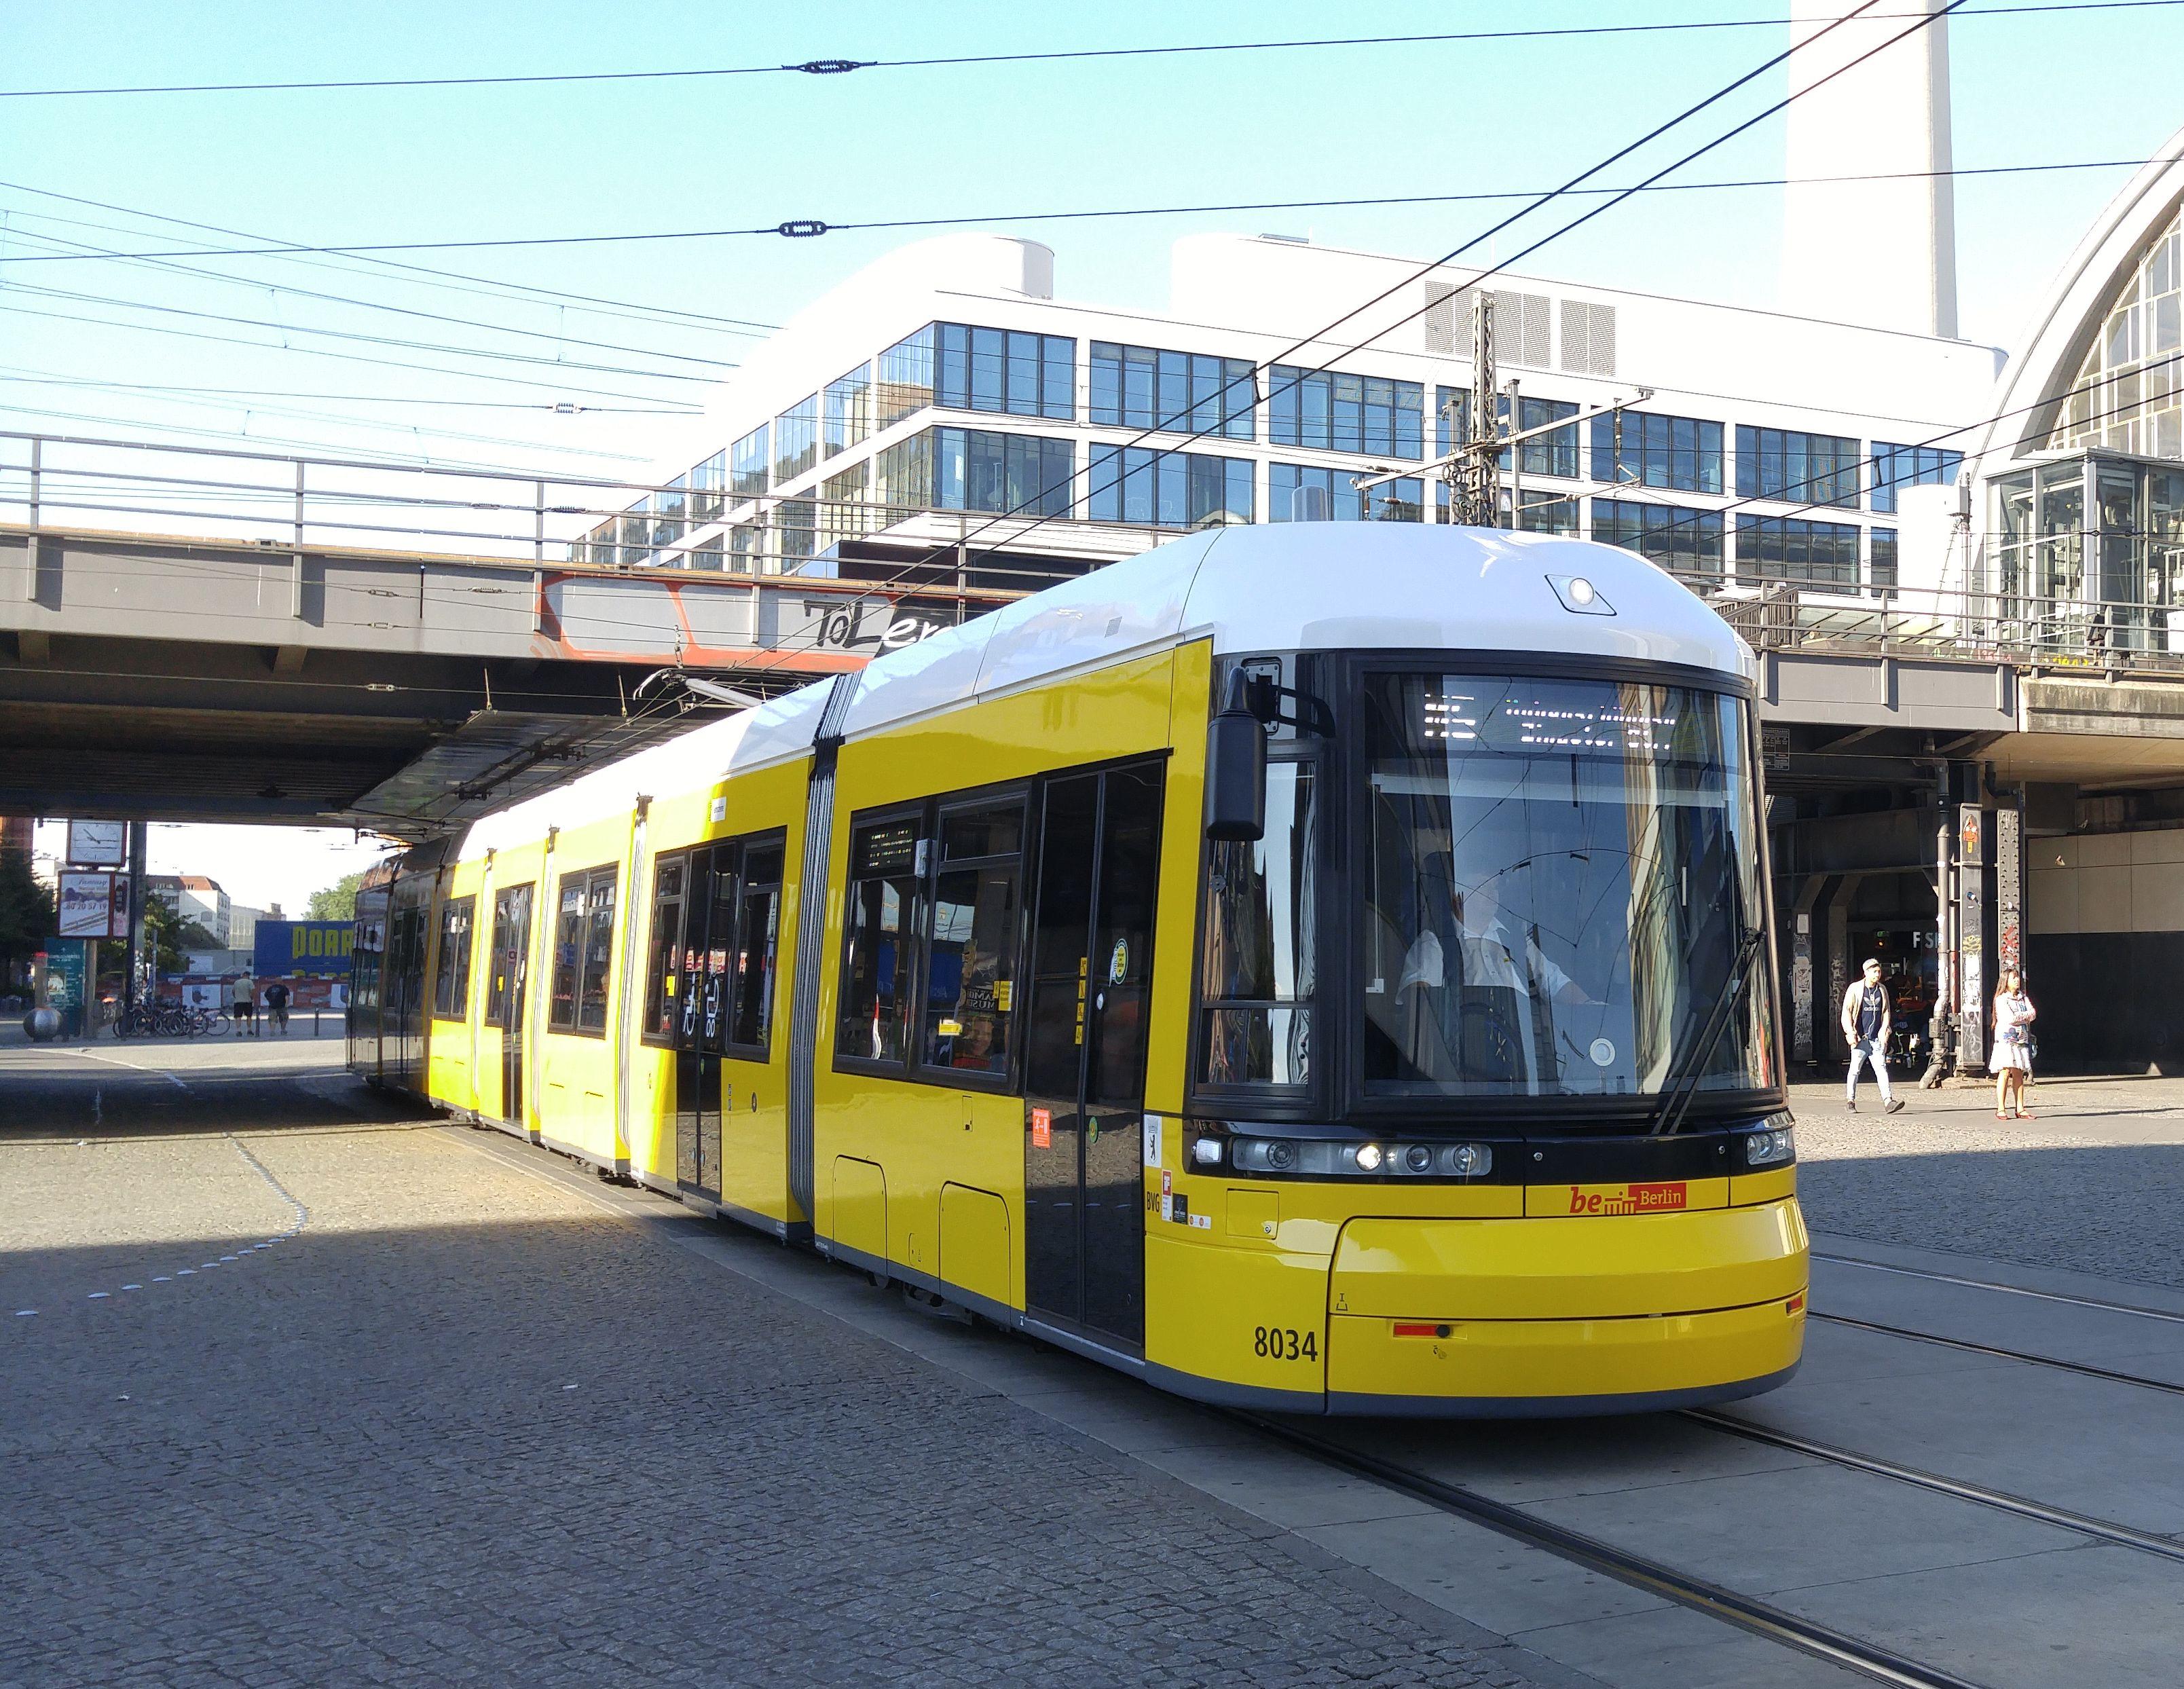 Foto: Straßenbahn 8034, Typ Flexity ERL, Alexanderplatz, 2016